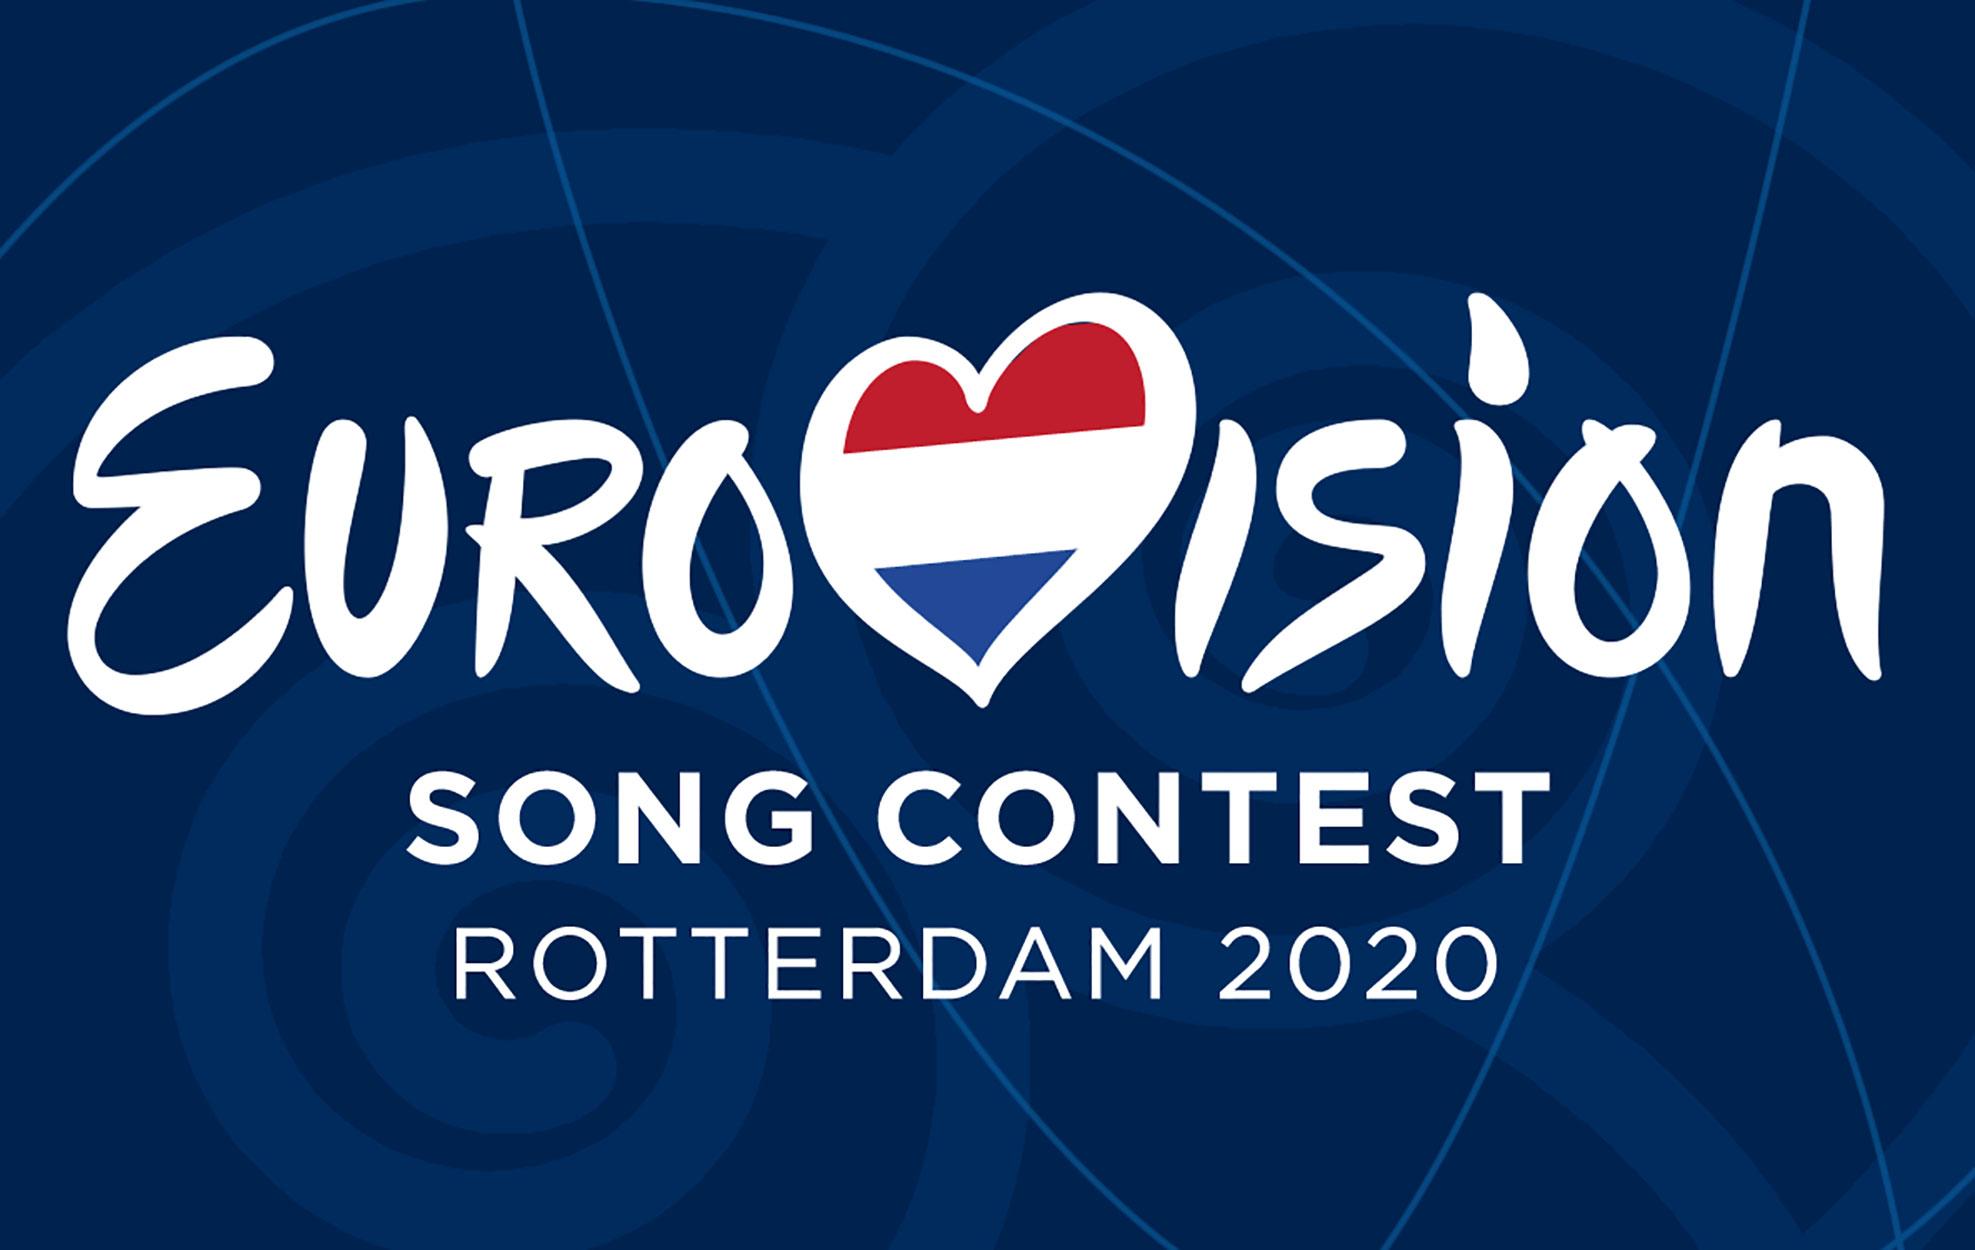 Eurovision... αλλιώς! Τι σκέφτονται να κάνουν οι διοργανωτές μετά την ακύρωση του διαγωνισμού